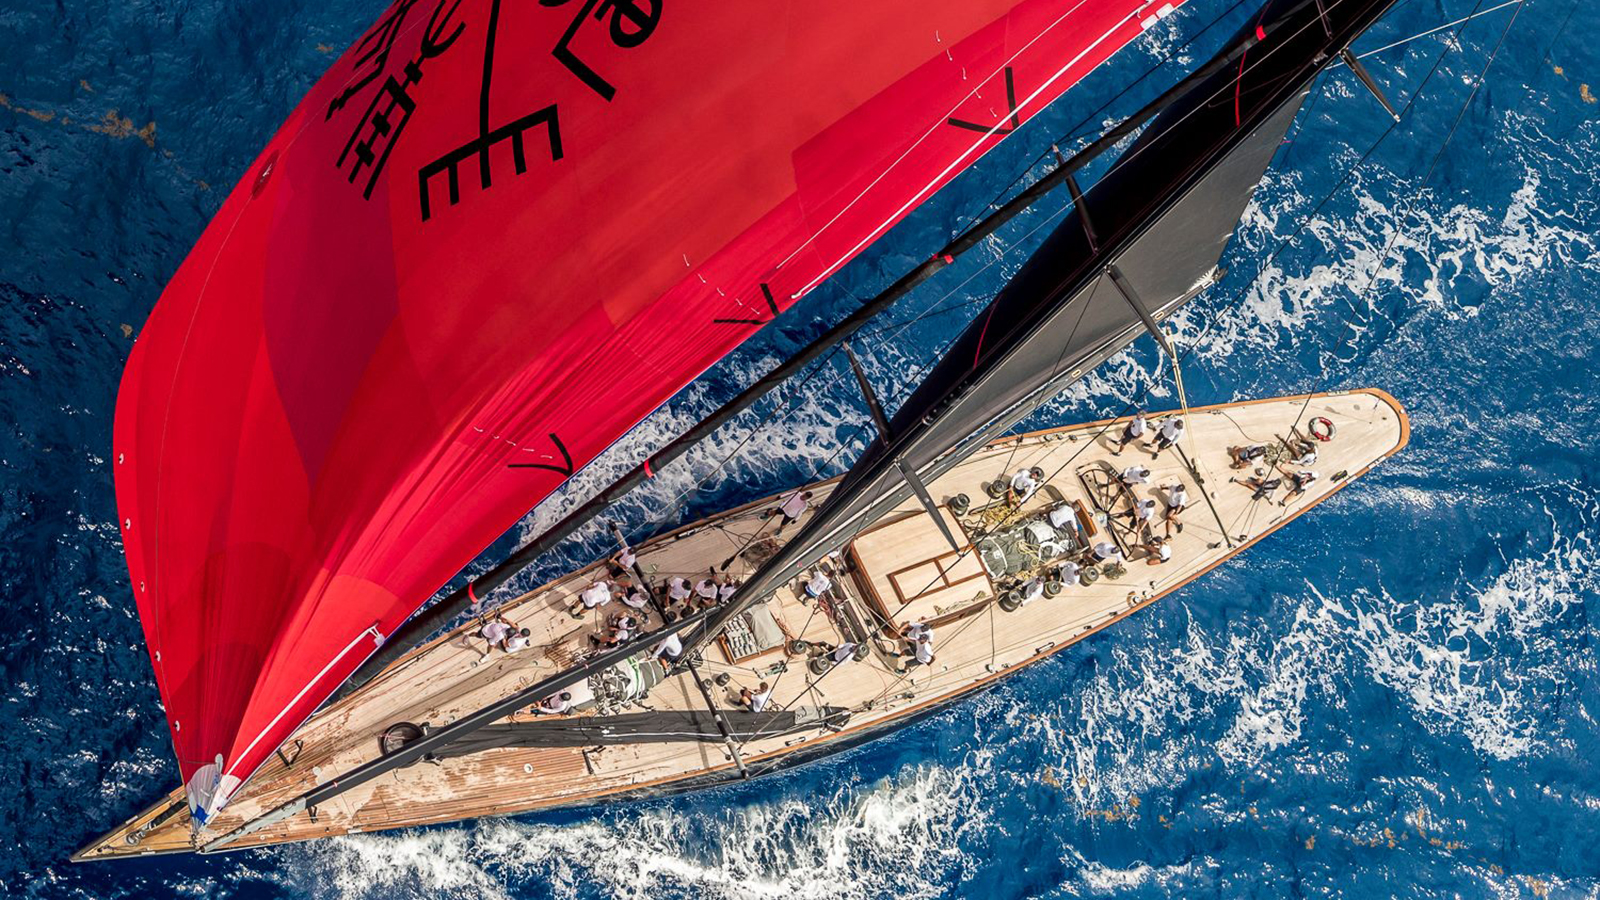 the-j-class-sailing-yacht-svea-racing-at-the-2018-st-barths-bucket-regatta-credit-carlo-borlenghi